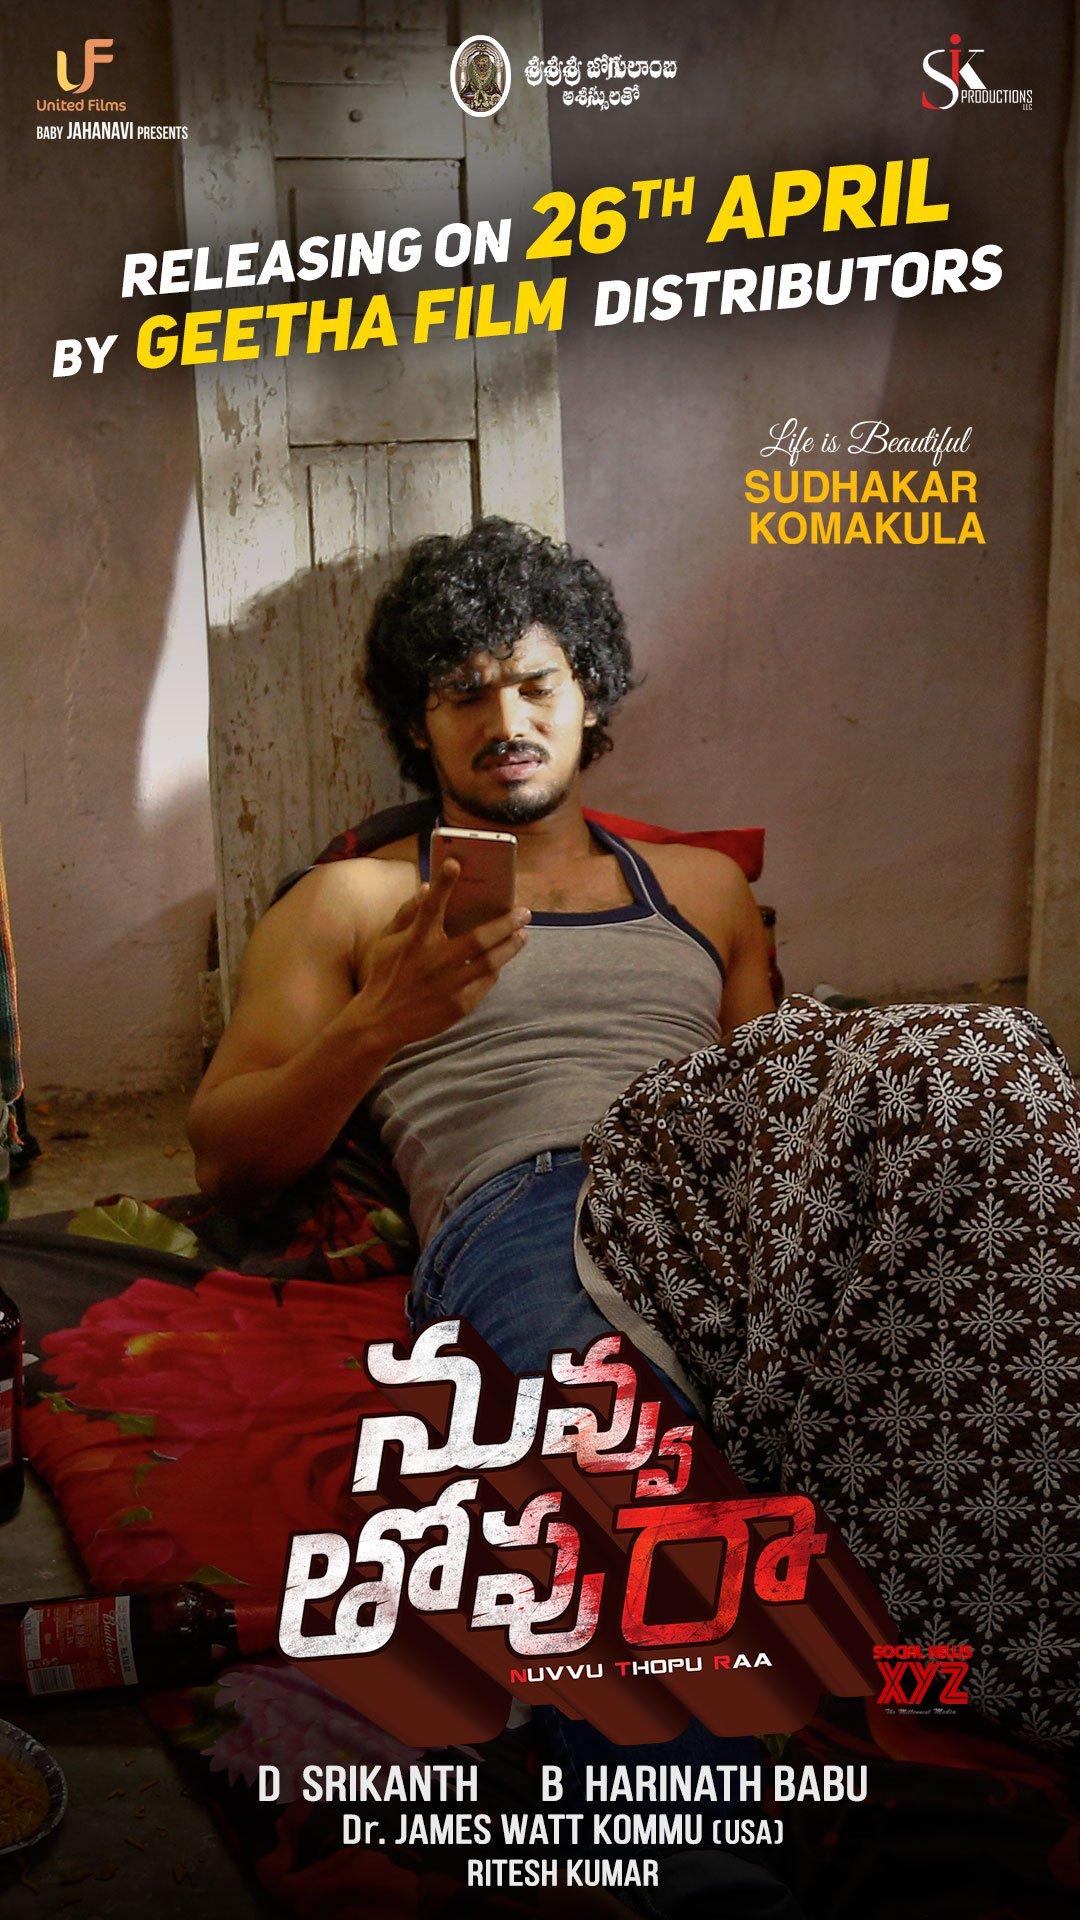 Nuvvu Thopu Raa Movie Release Date Posters